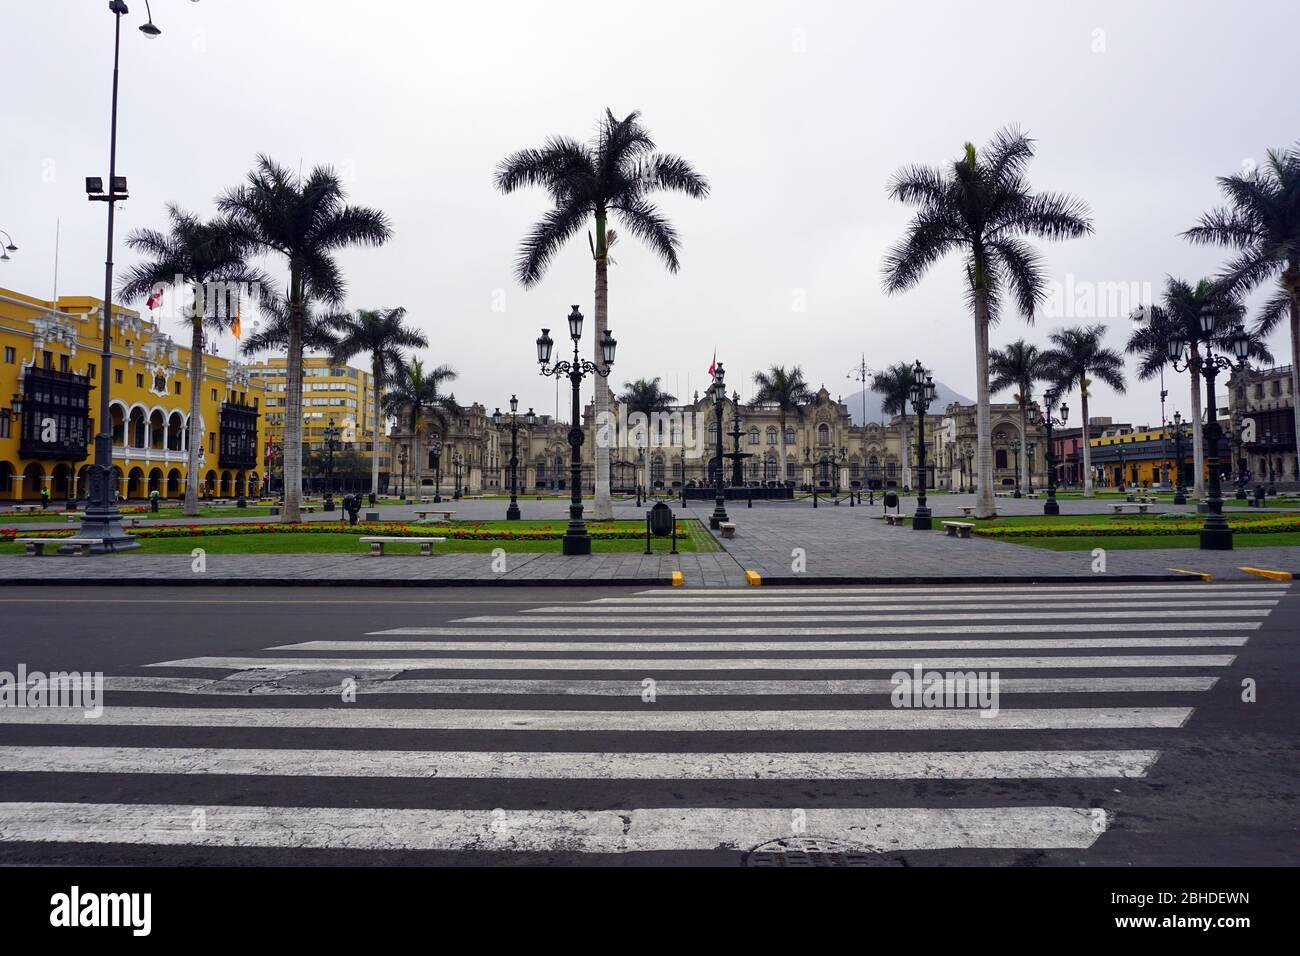 Main square of Lima city, Peru Stock Photo